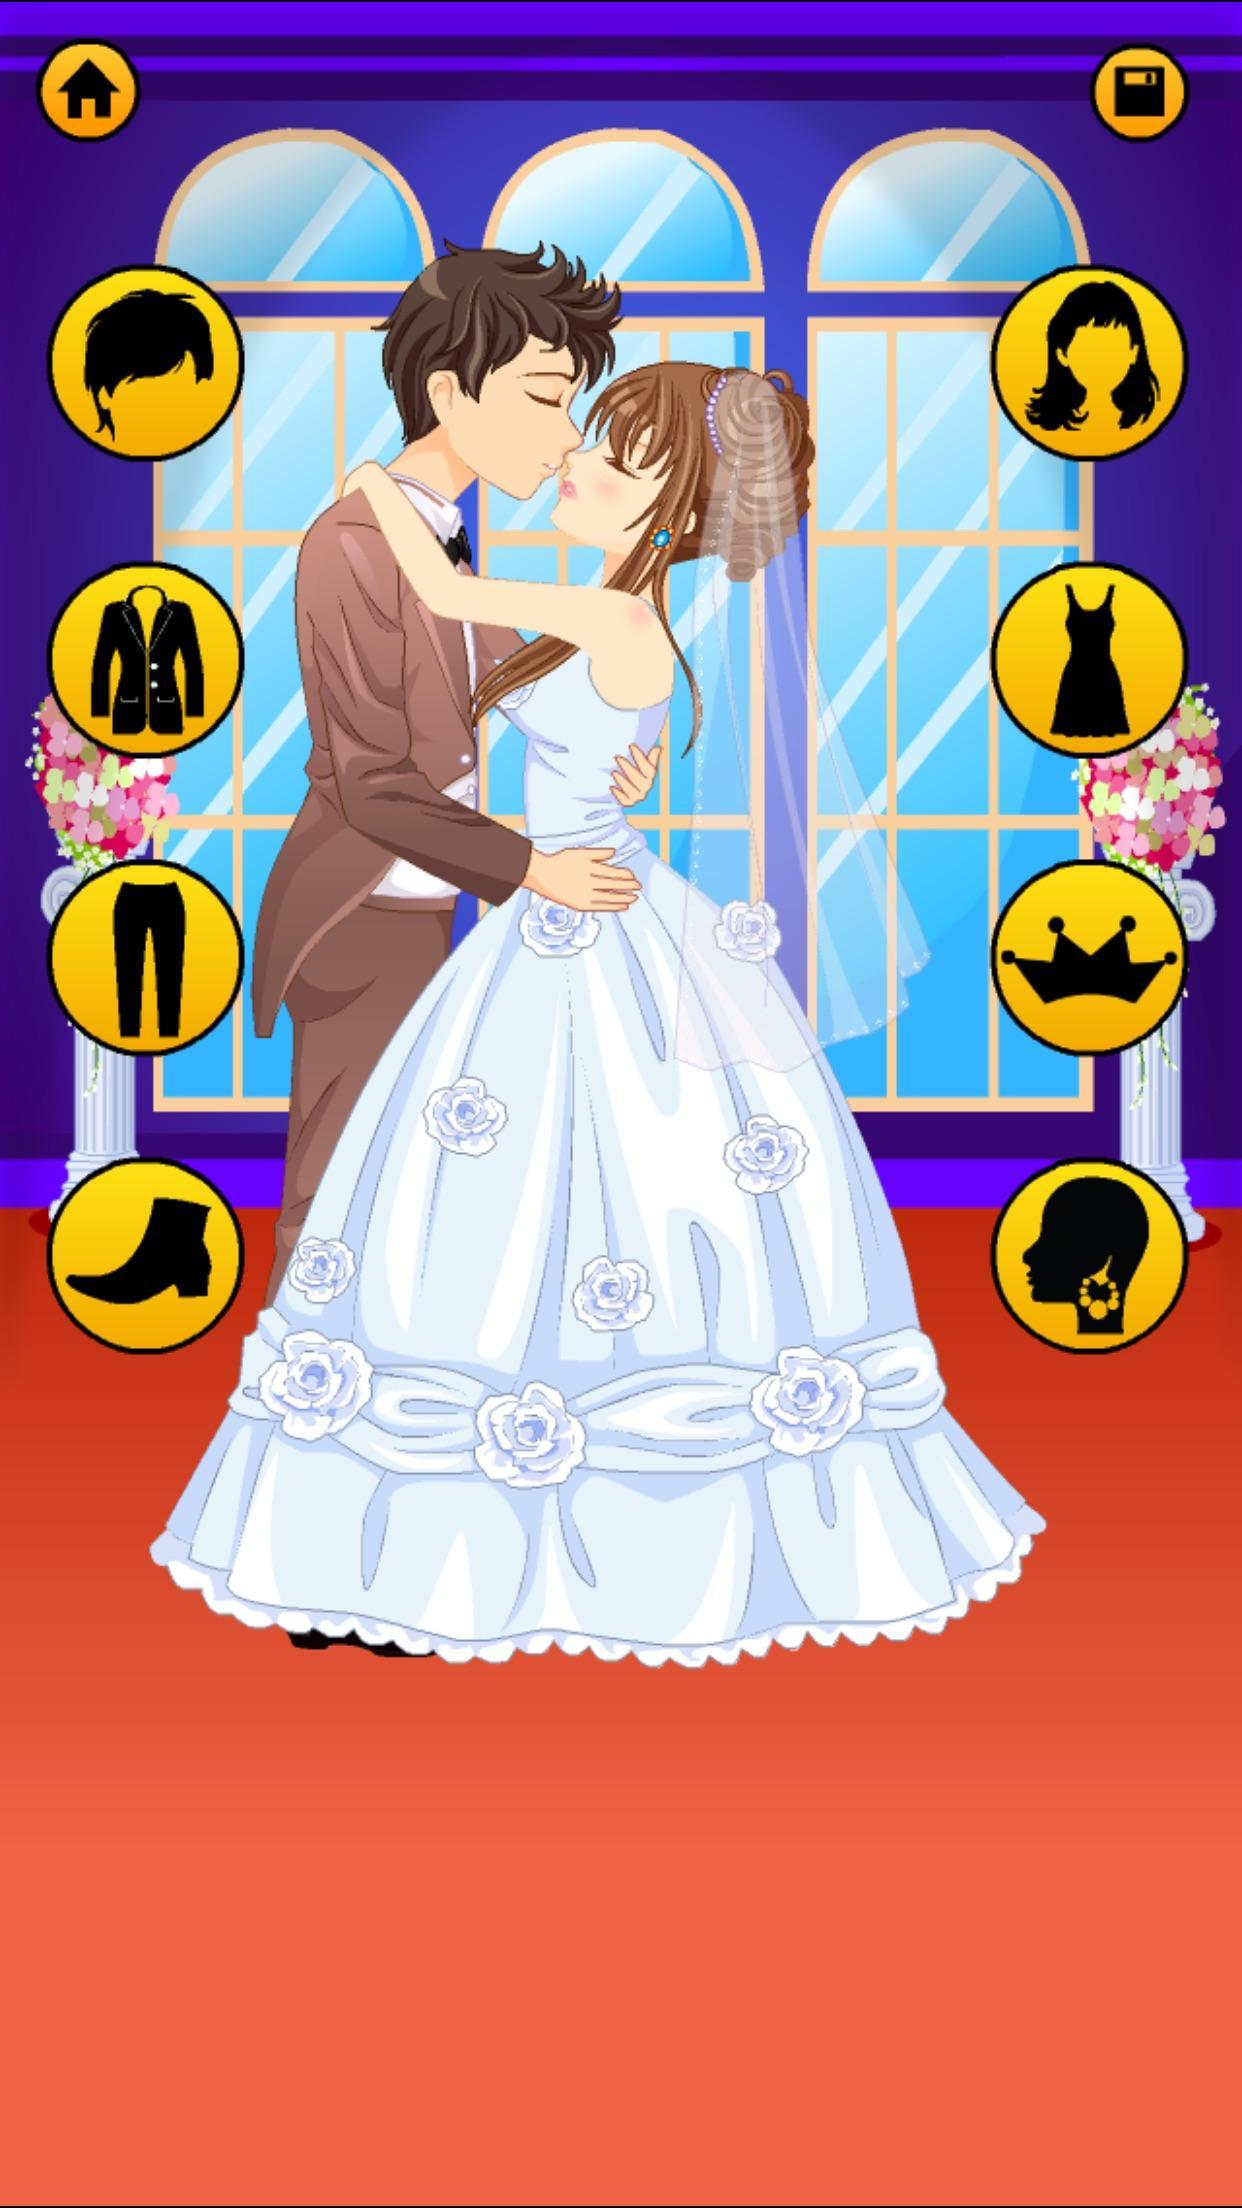 Anime Dress Up Games For Girls - Couple Love Kiss 3.3 Screenshot 11